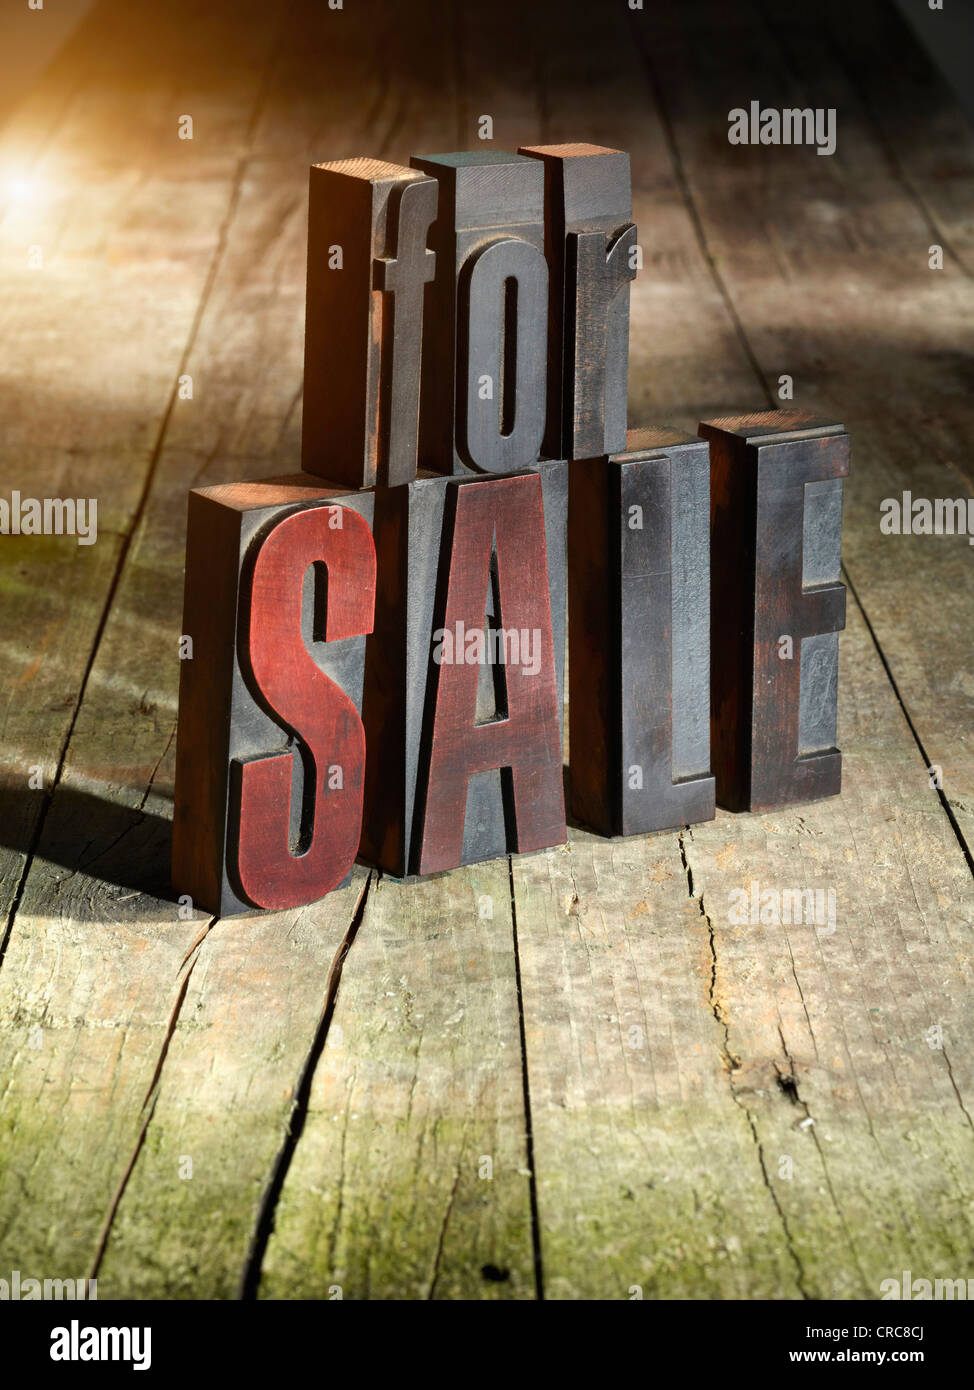 Wooden blocks spelling for sale - Stock Image